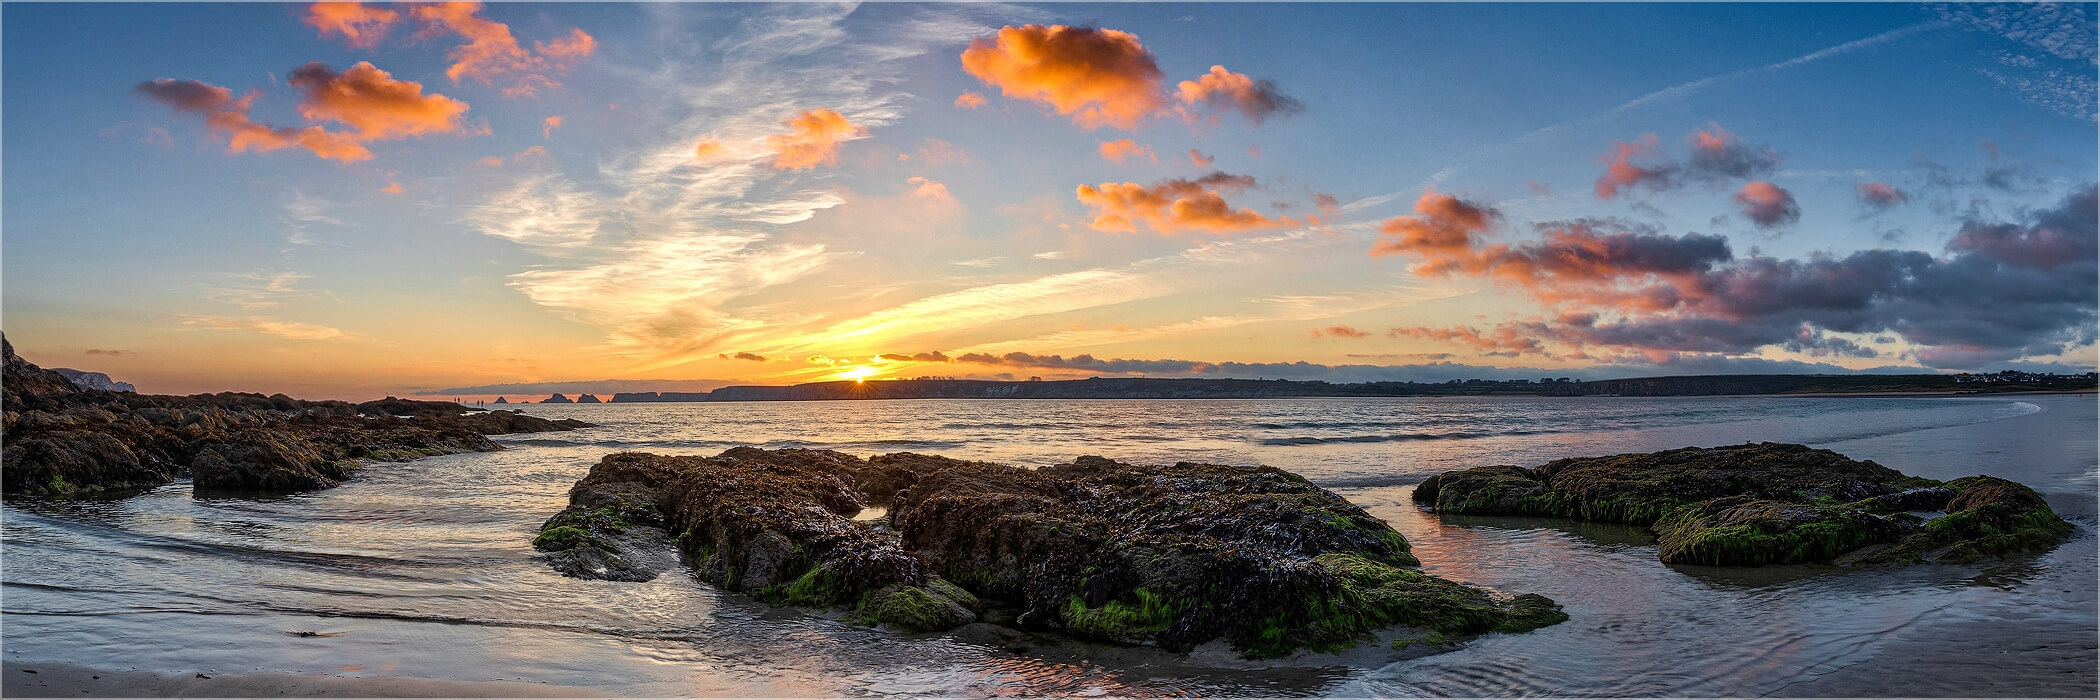 Panoramabild Bretagne Sonnenuntergang Plage de Goulien